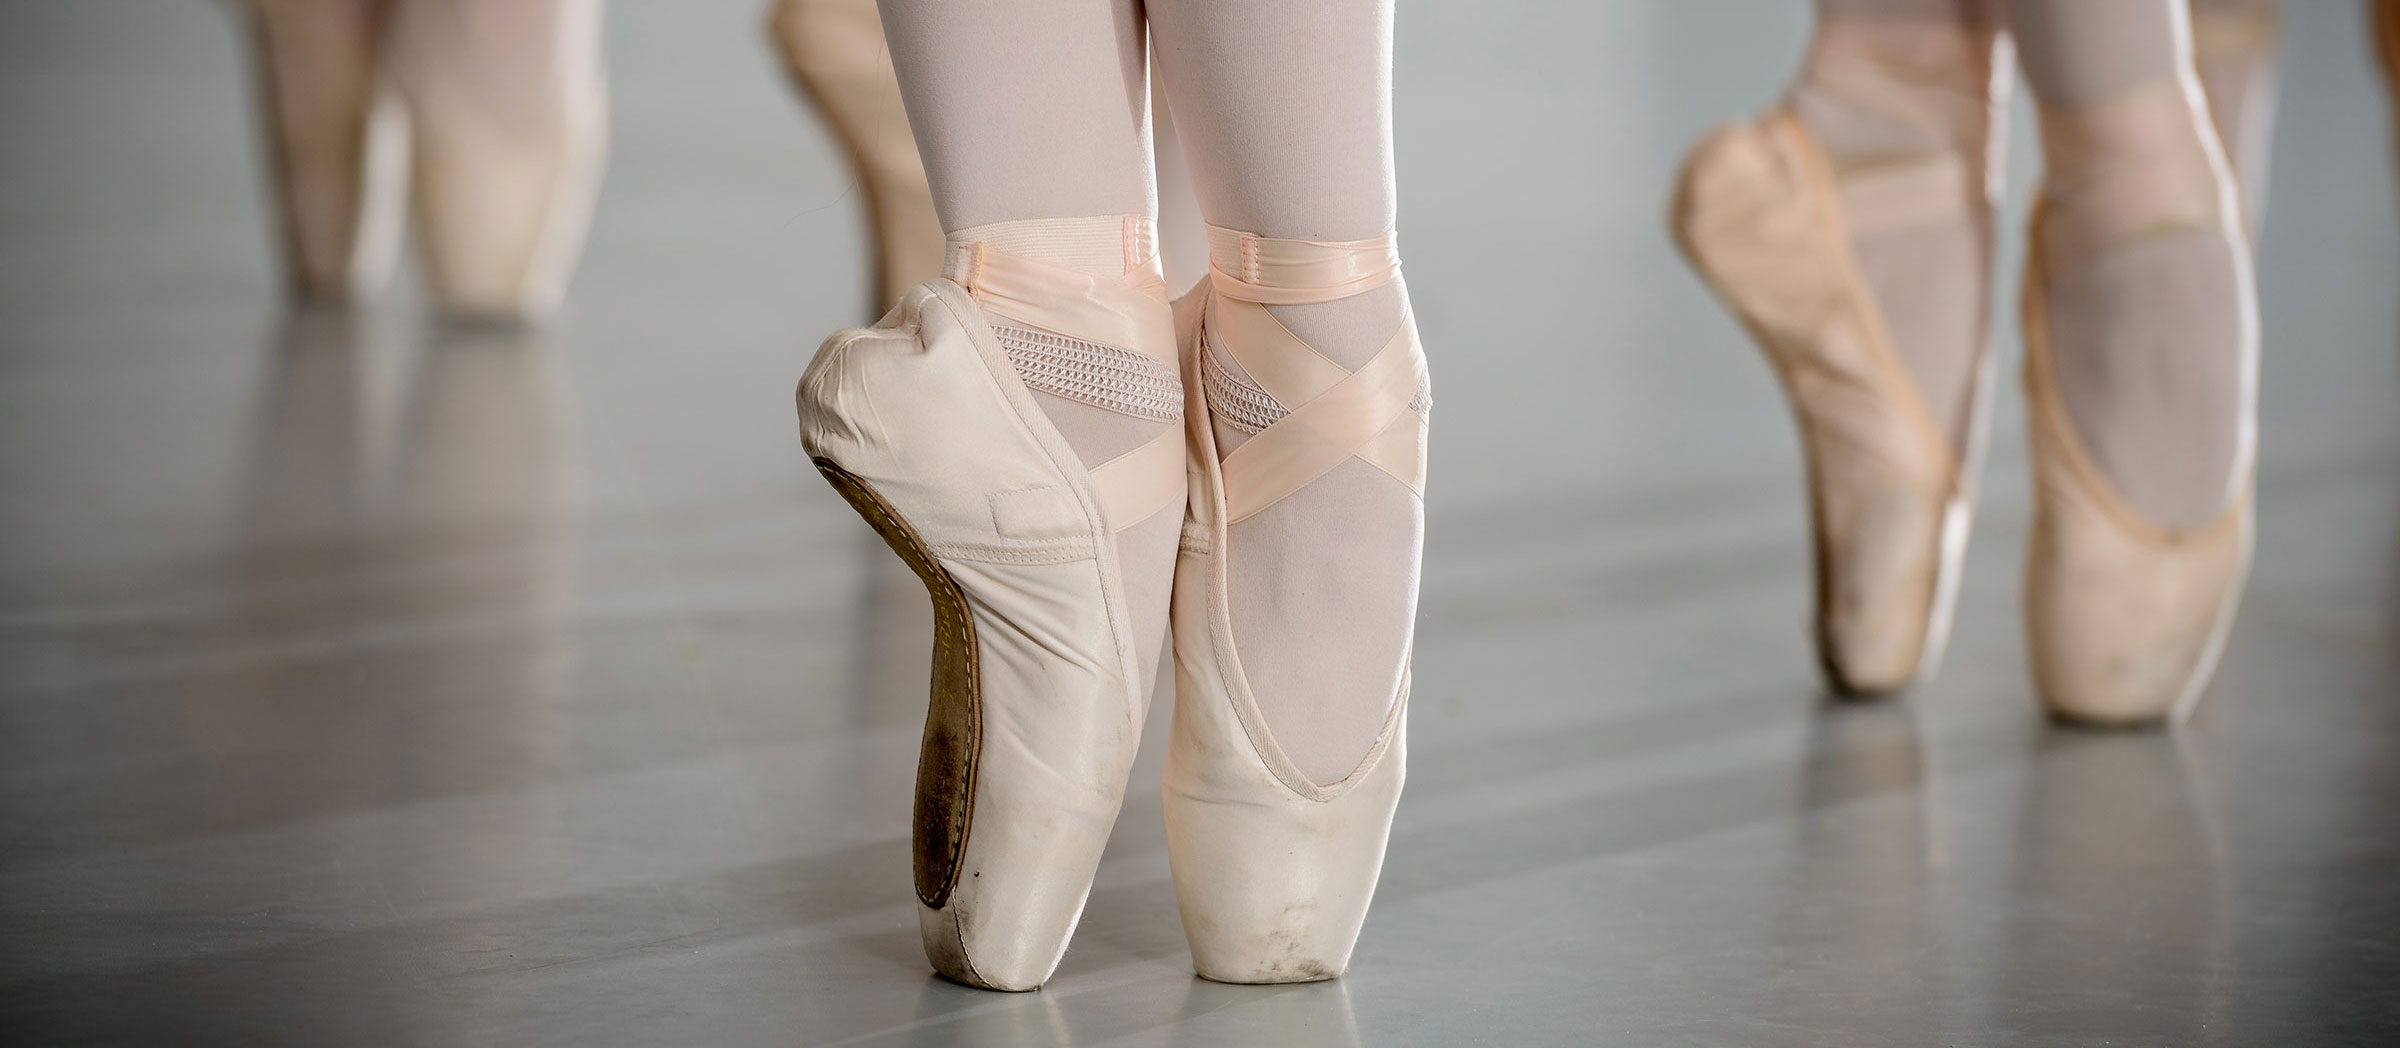 Amanda Bollinger Dance Academy - Training Programs - www.vaganova.com.au - Photo by Stephan Bollinger - www.stephanbollinger.com - All rights reserved.